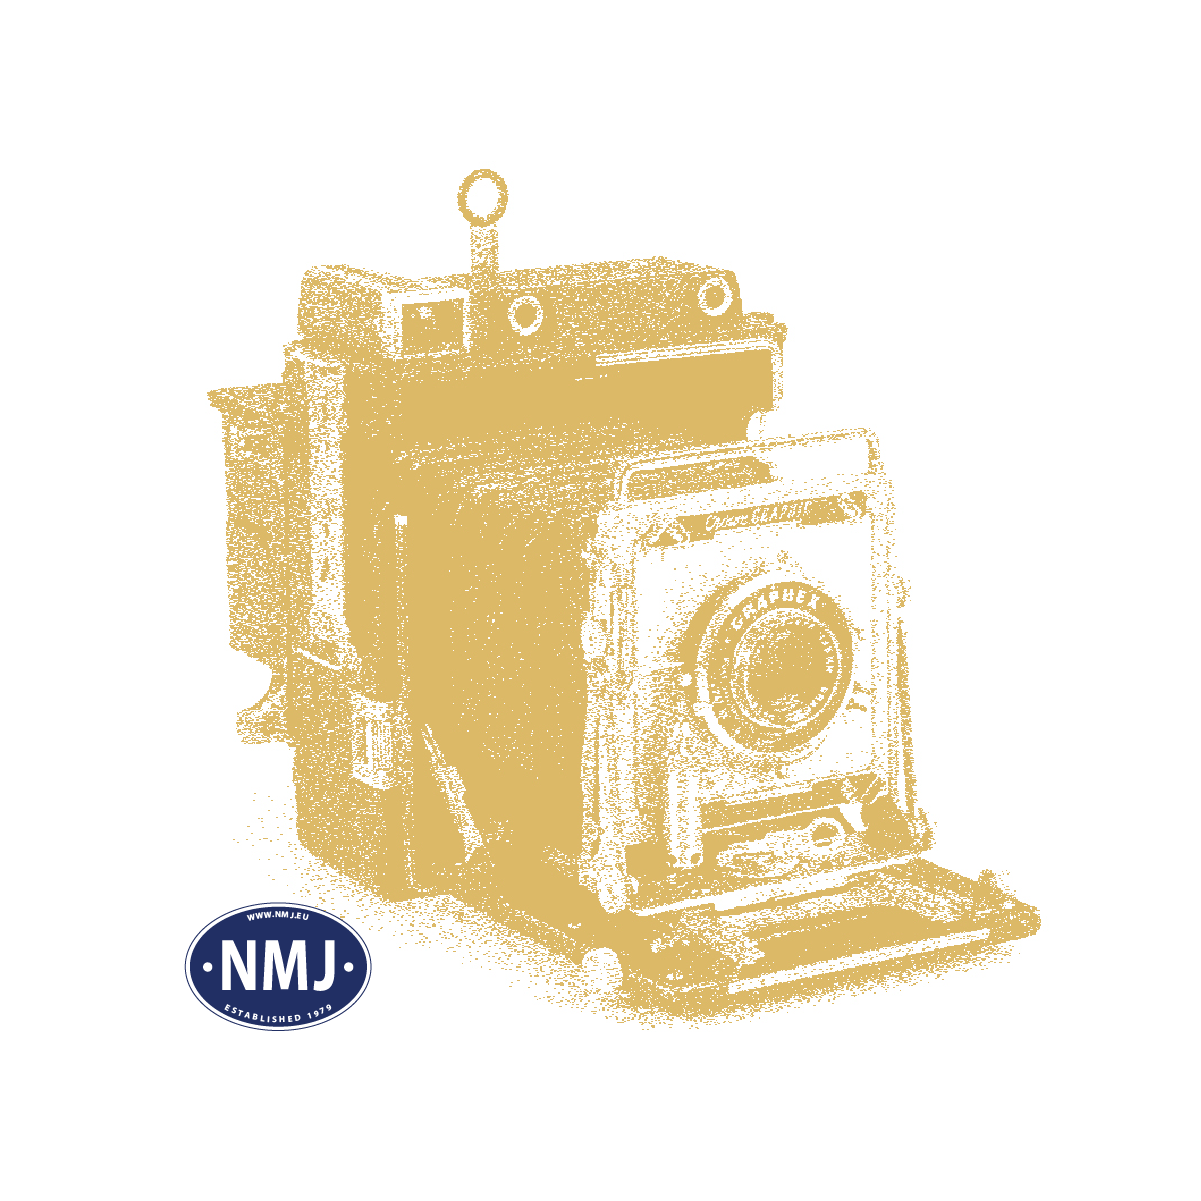 NMJT84.103 - NMJ Topline NSB BM69A.14, DC